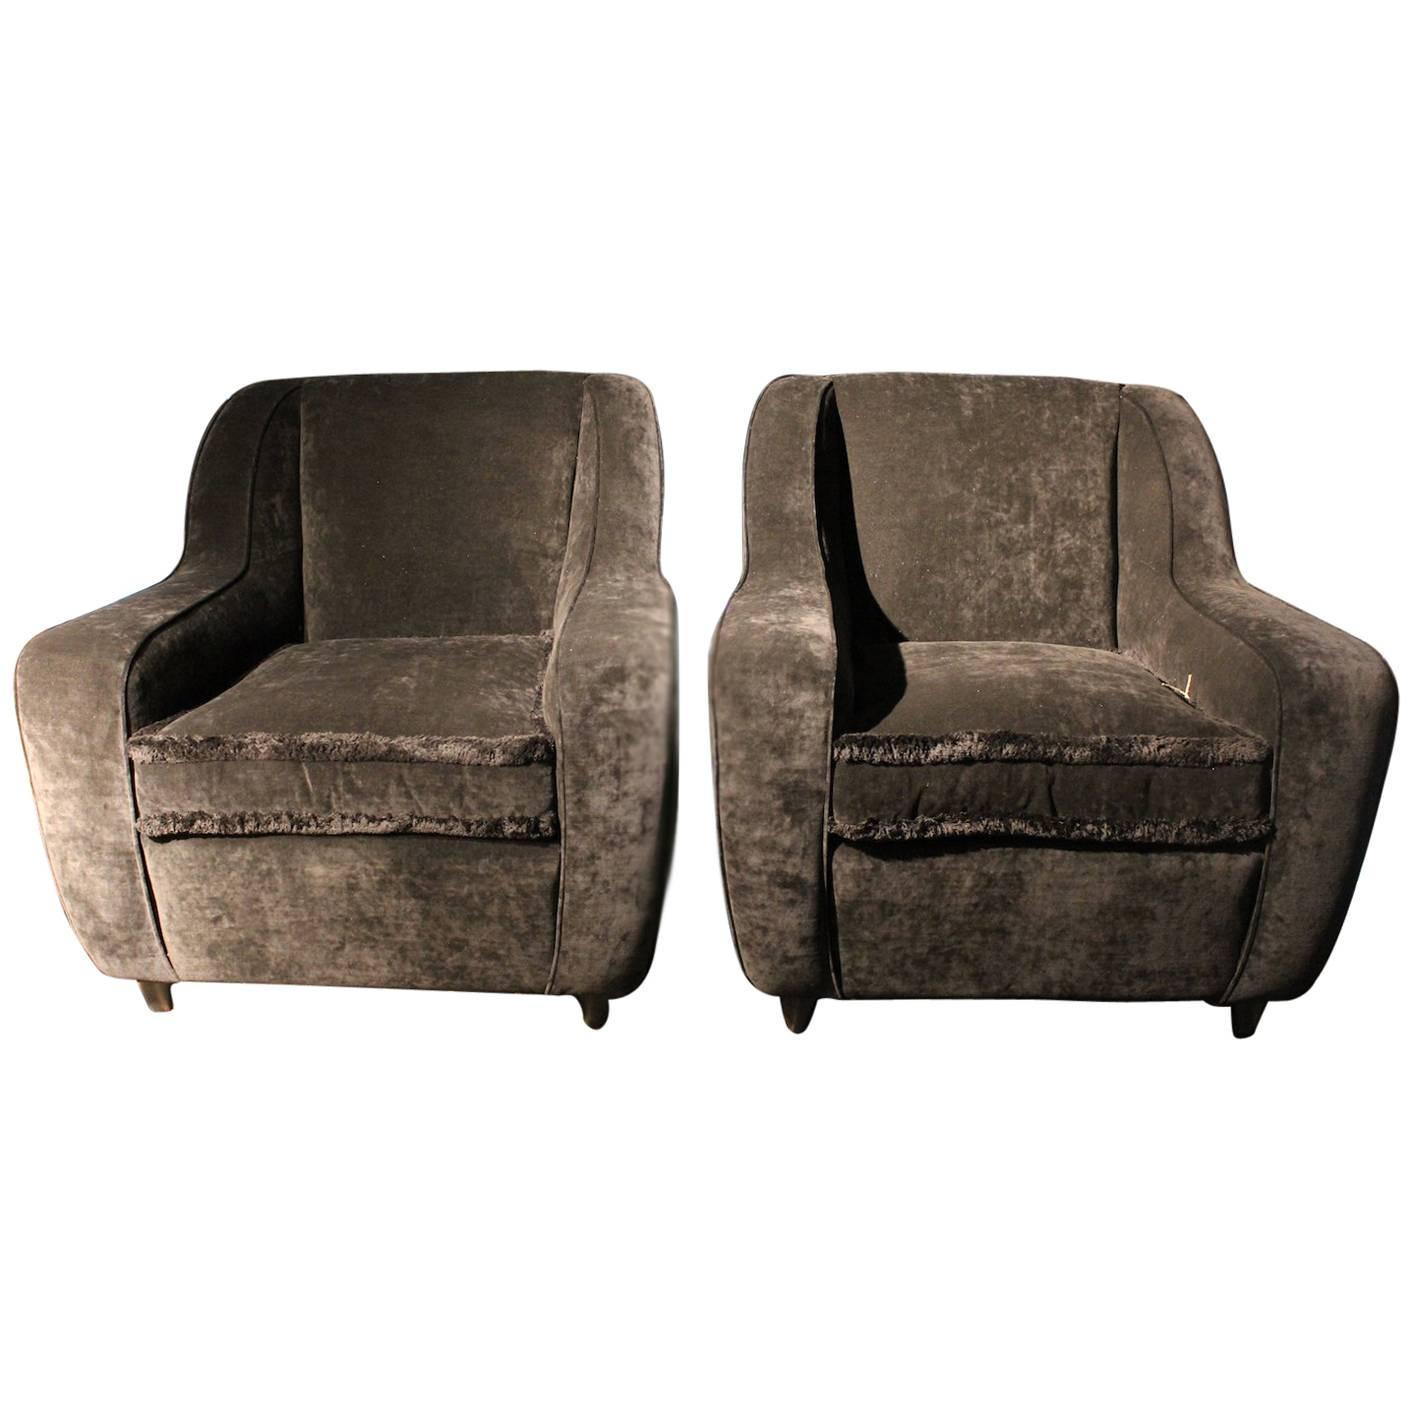 Pair of Beautiful 1960s Armchairs in Black Cotton Velvet